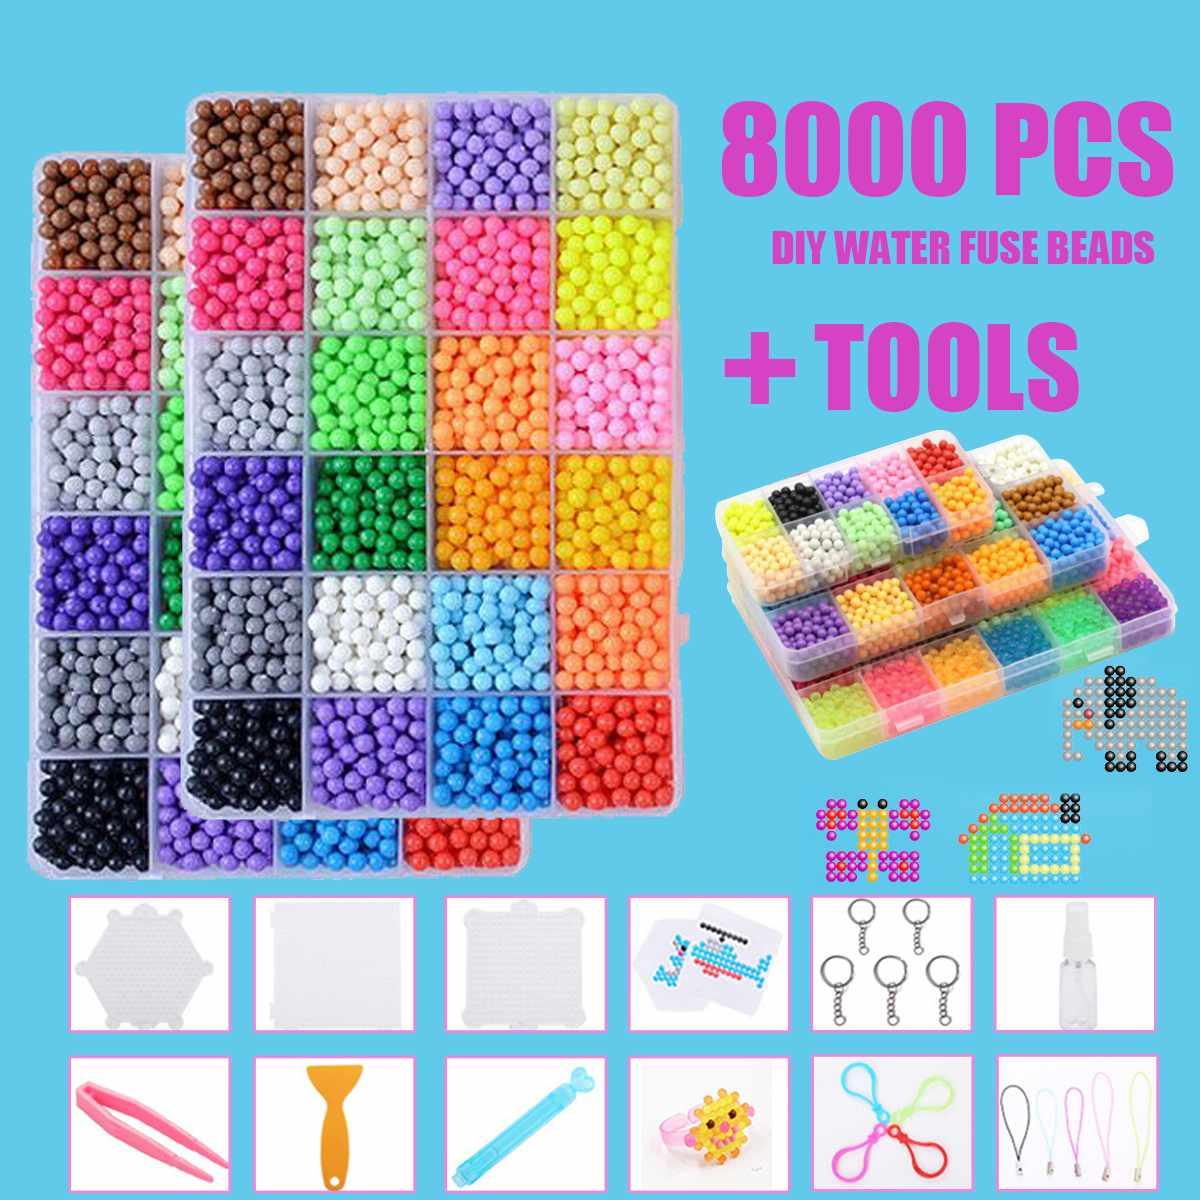 8000pcs Magic Puzzle Toys Water Mist Bead Set Boys Girls DIY Craft Animal Handmade Sticky Beads Educational Toys Kids Gifts